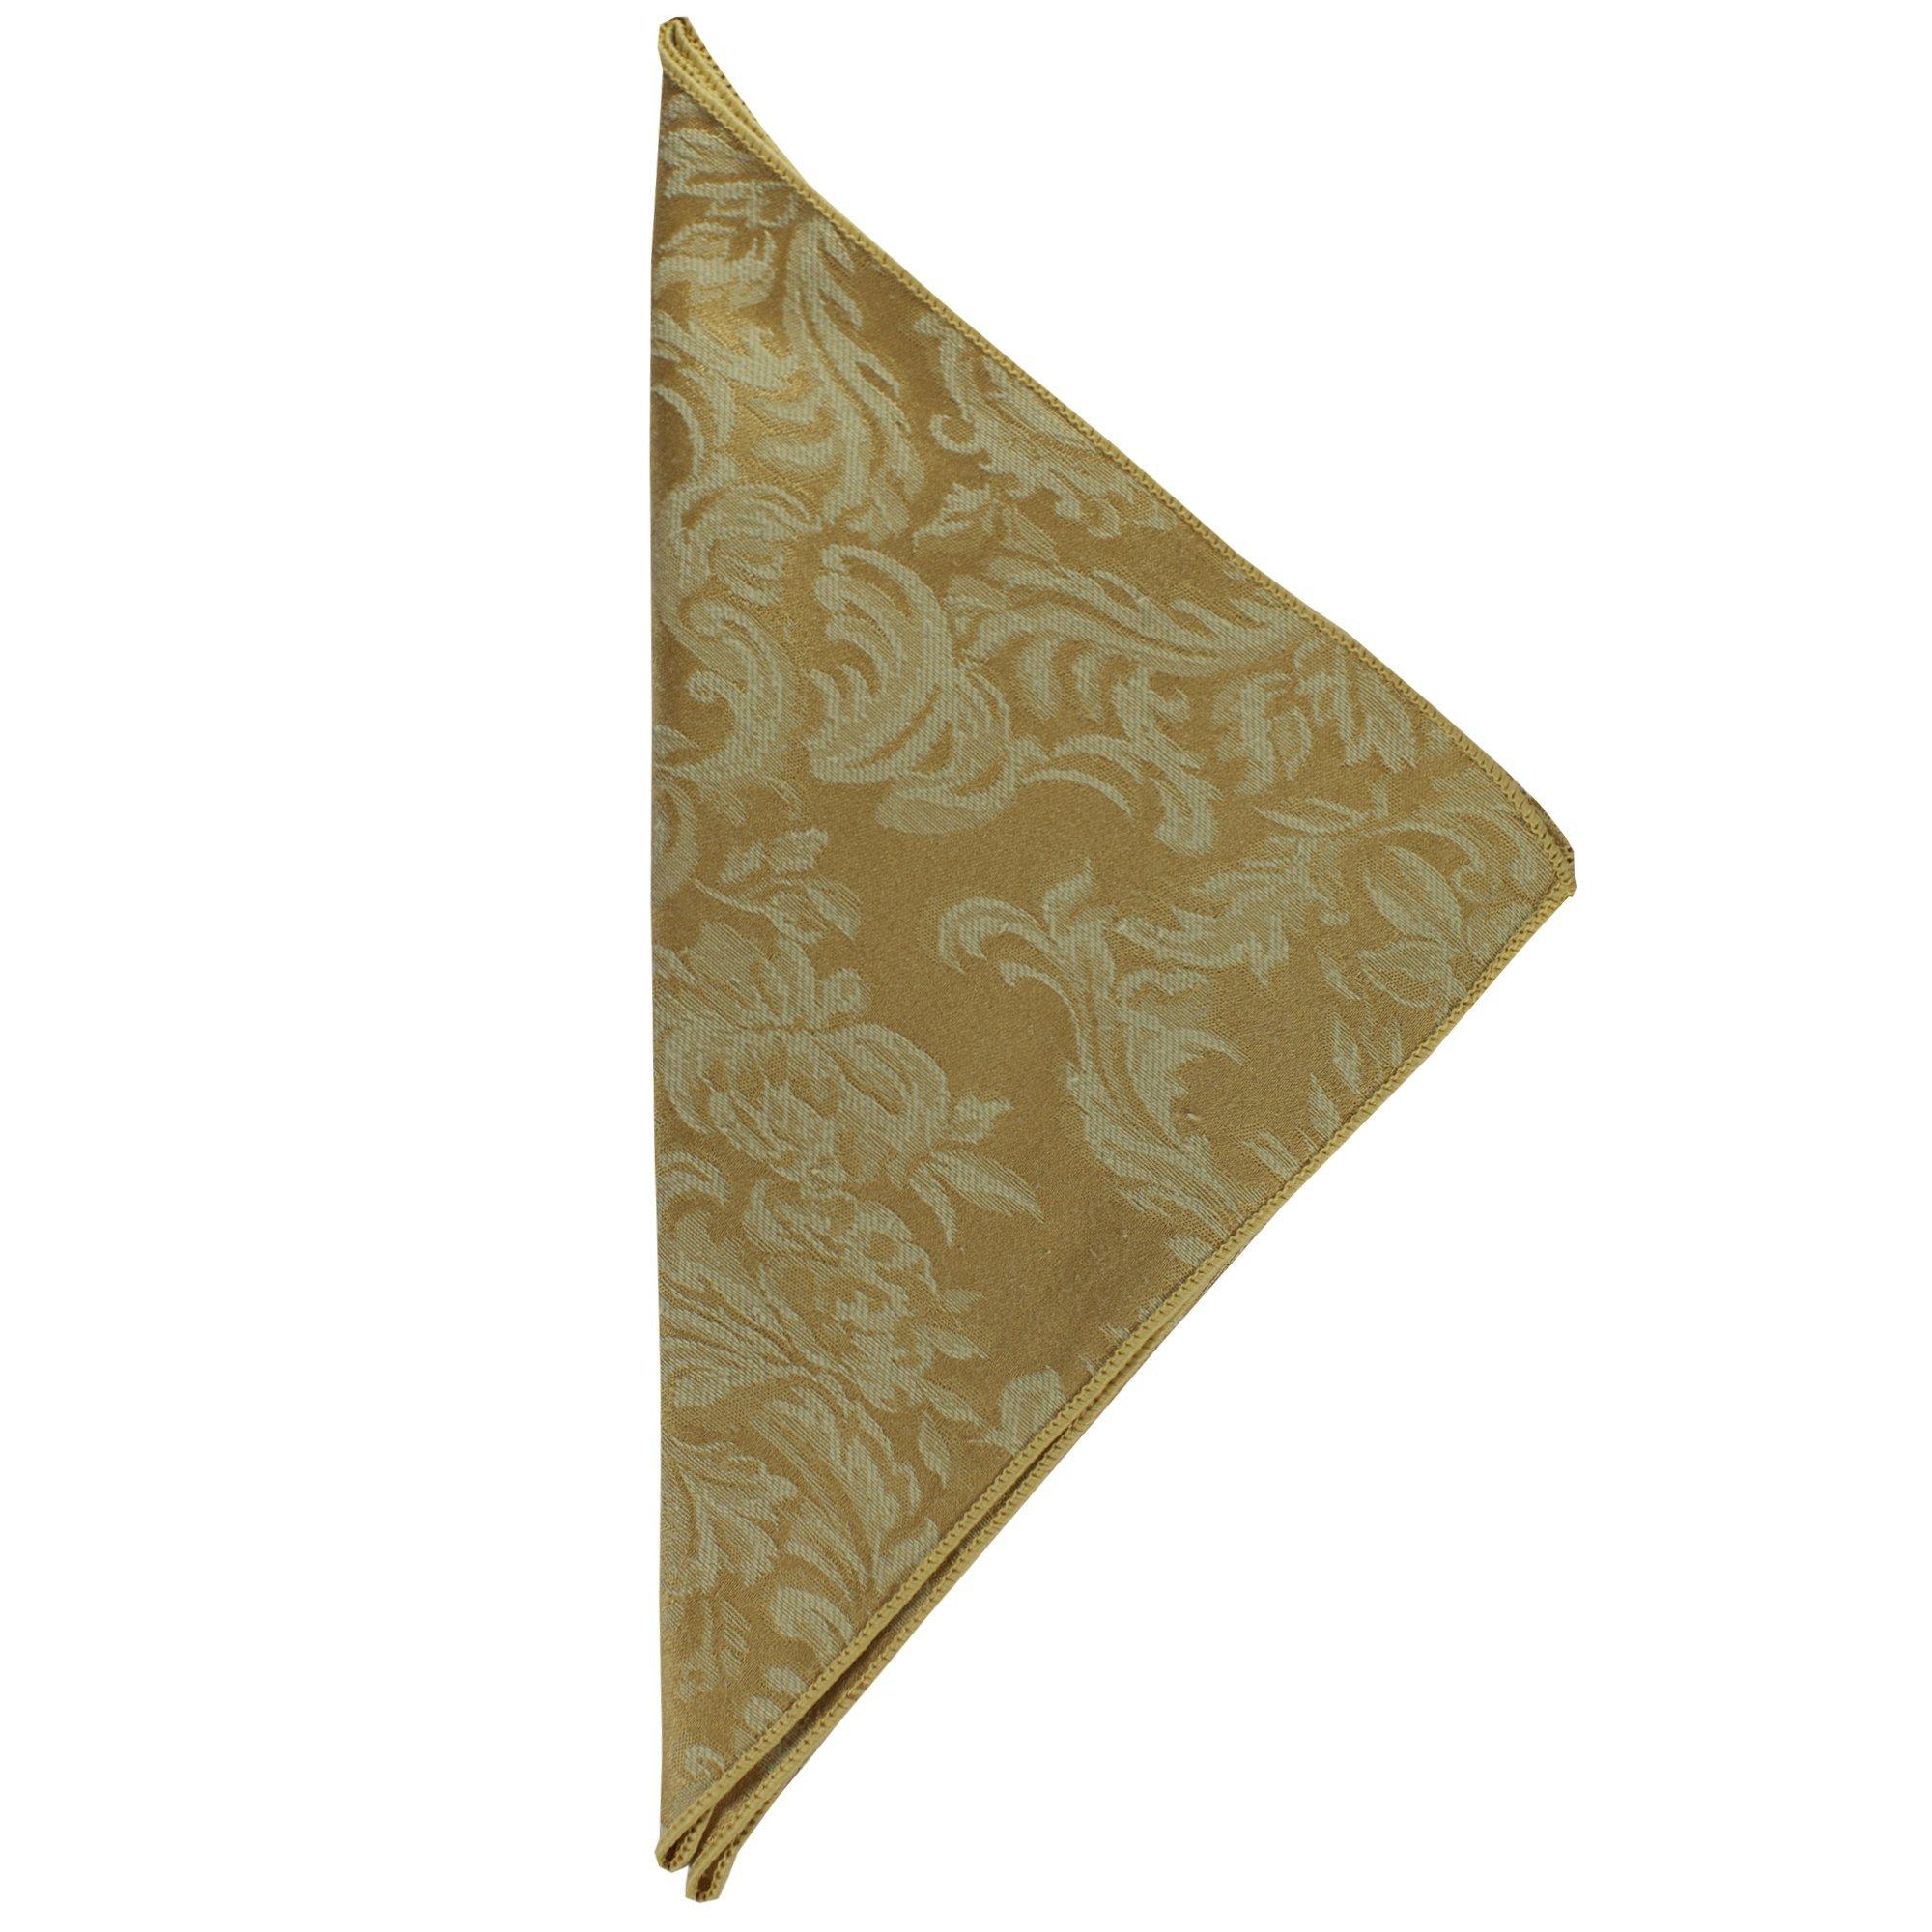 Ultimate Textile (10 Dozen) Miranda 17 x 17-Inch Damask Cloth Napkins- Jacquard Weave, Dijon Gold